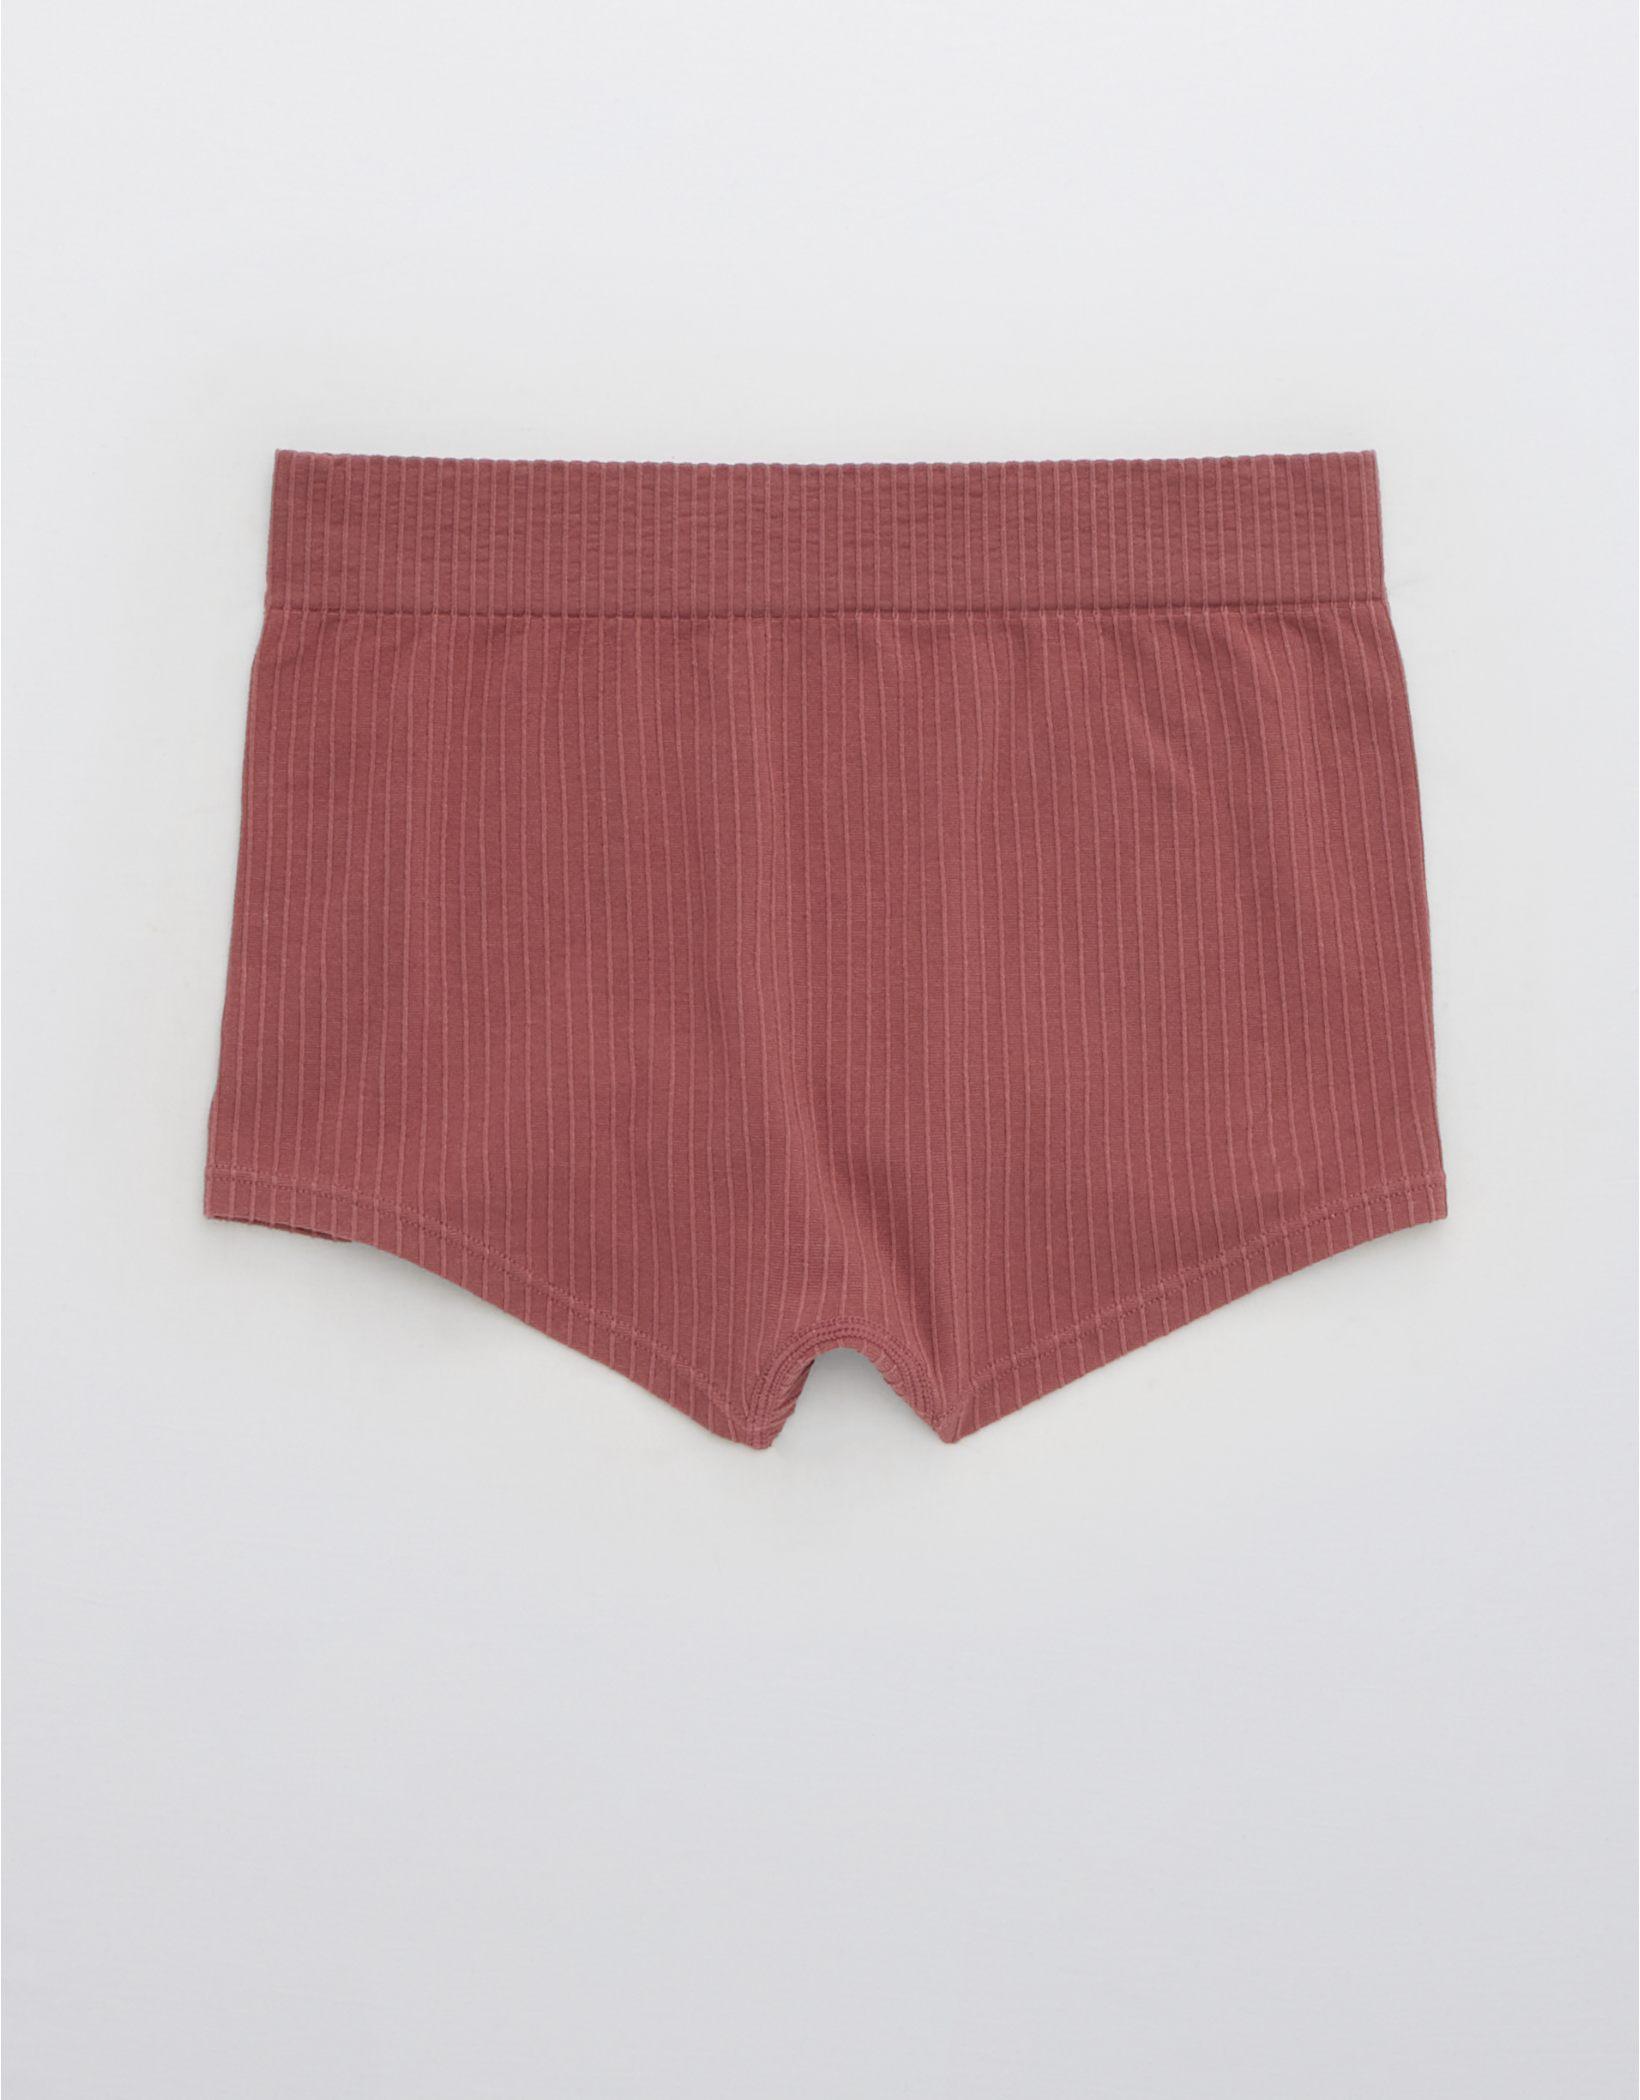 Aerie Ribbed Seamless Boyshort Underwear